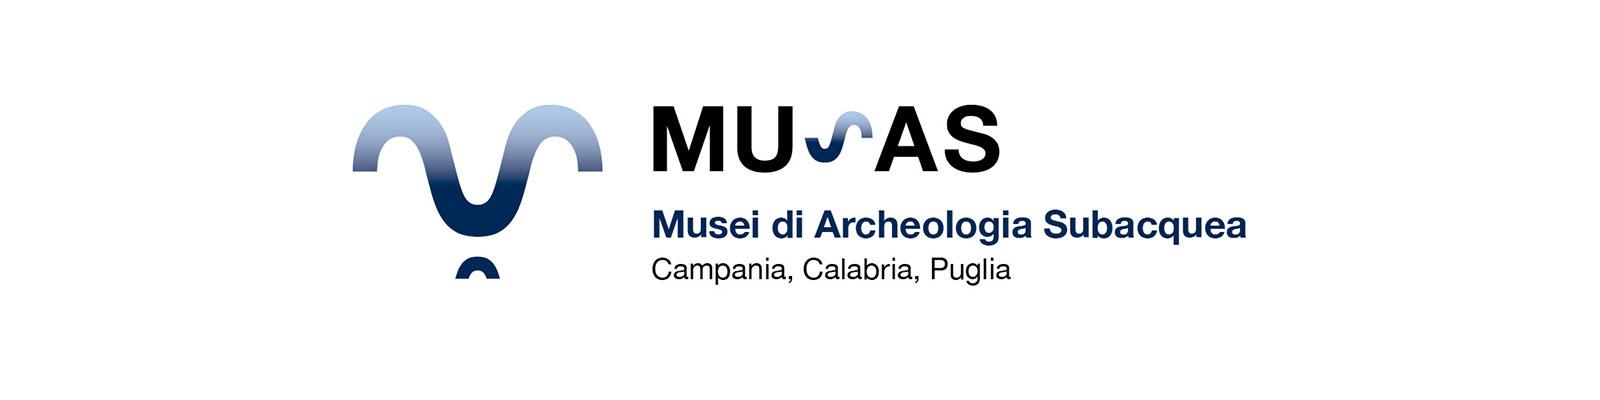 MUSAS-logo